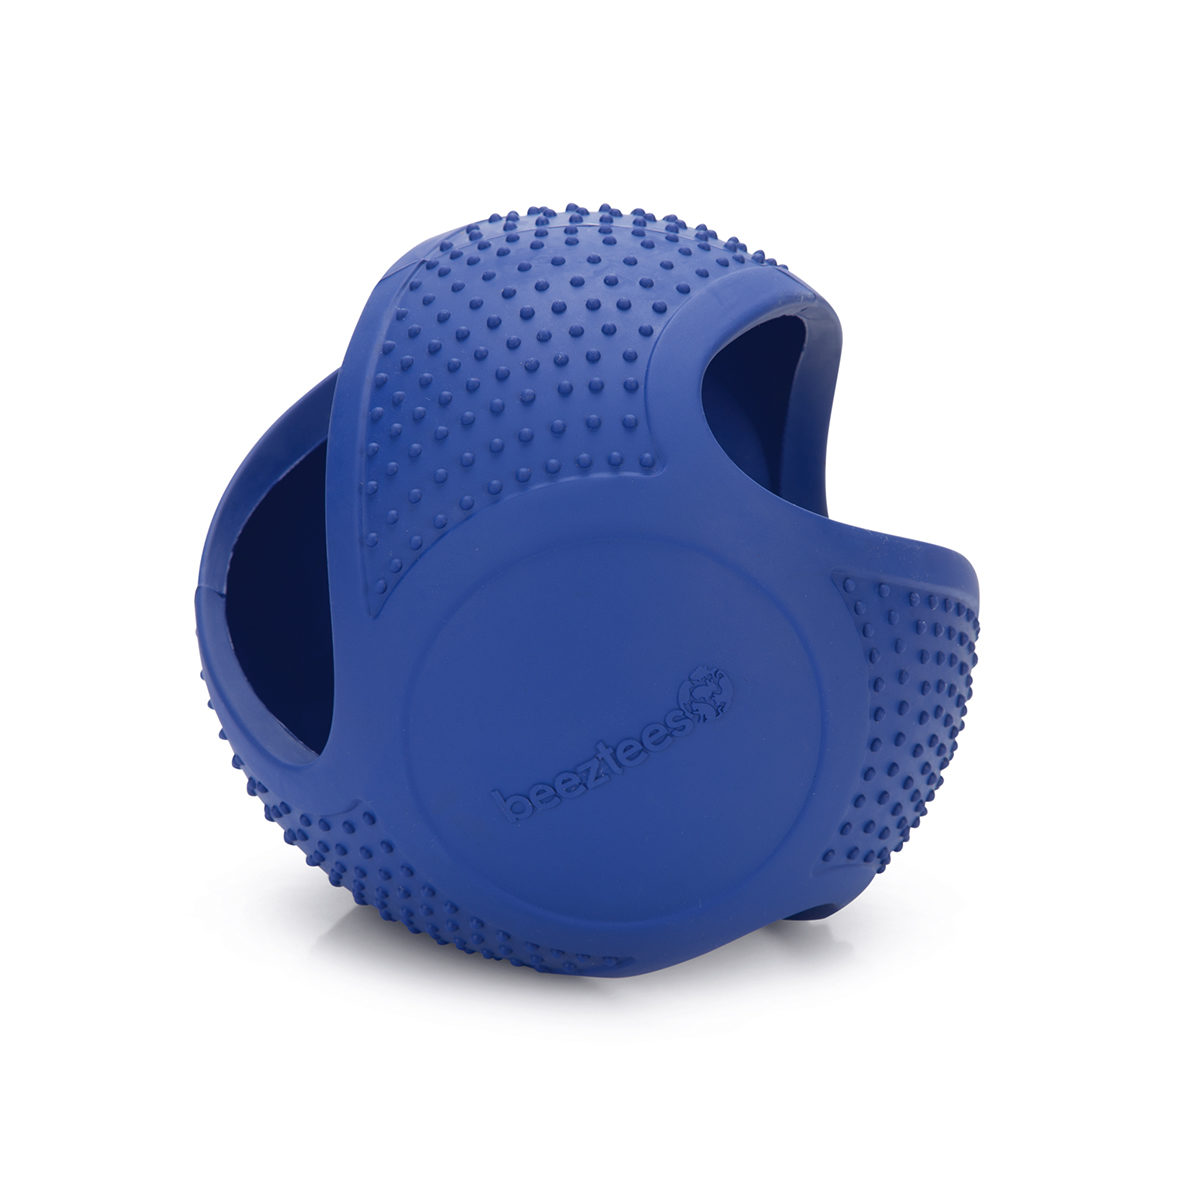 Beeztees Fetch Rubber Hondenspeelgoed Frisbee Bal 16cm Blauw